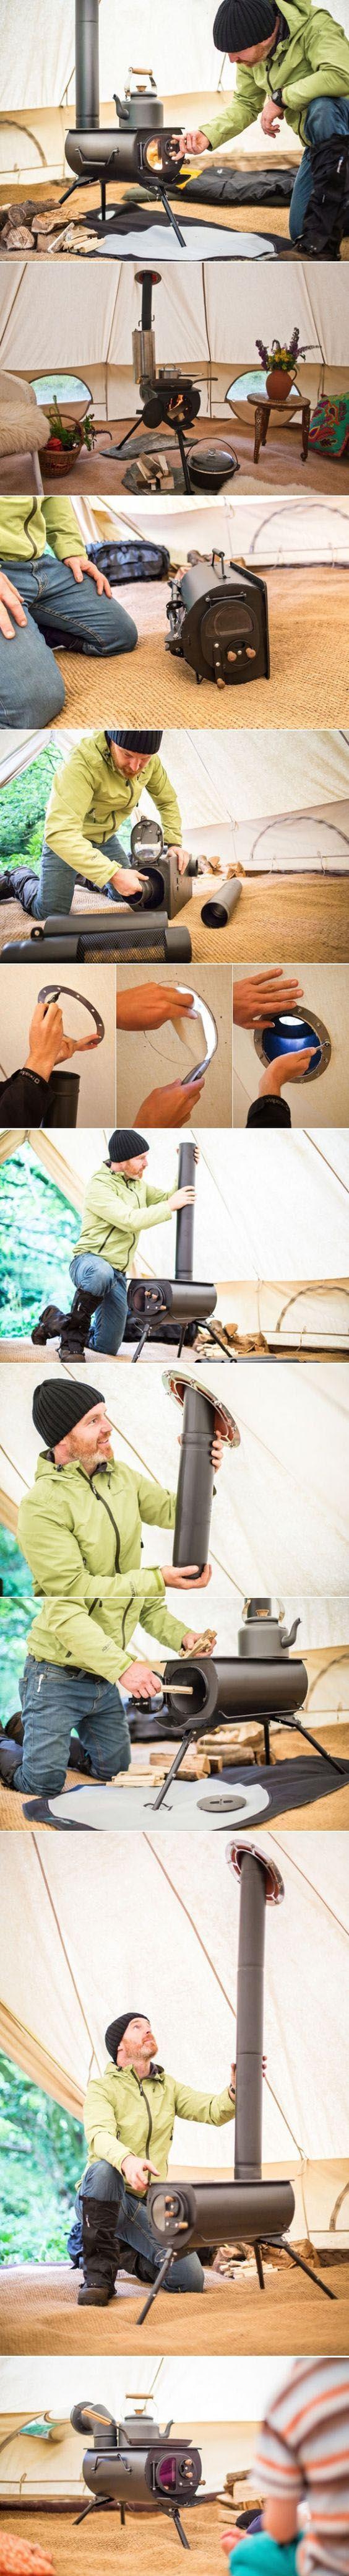 Best 25+ Tent stove ideas on Pinterest